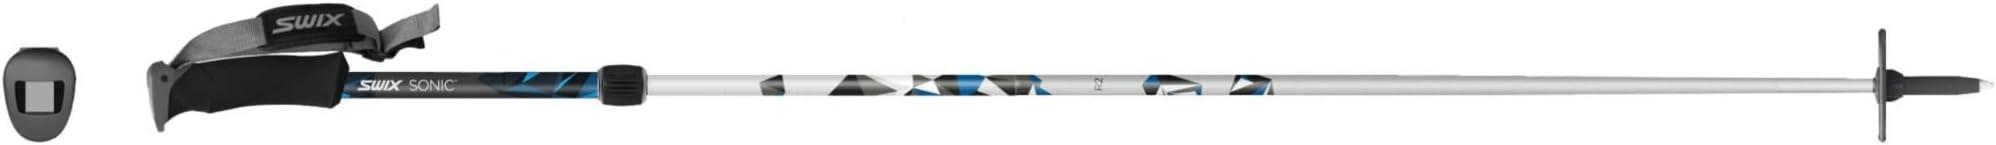 Swix Sonic R2 Adjustable Ski Poles